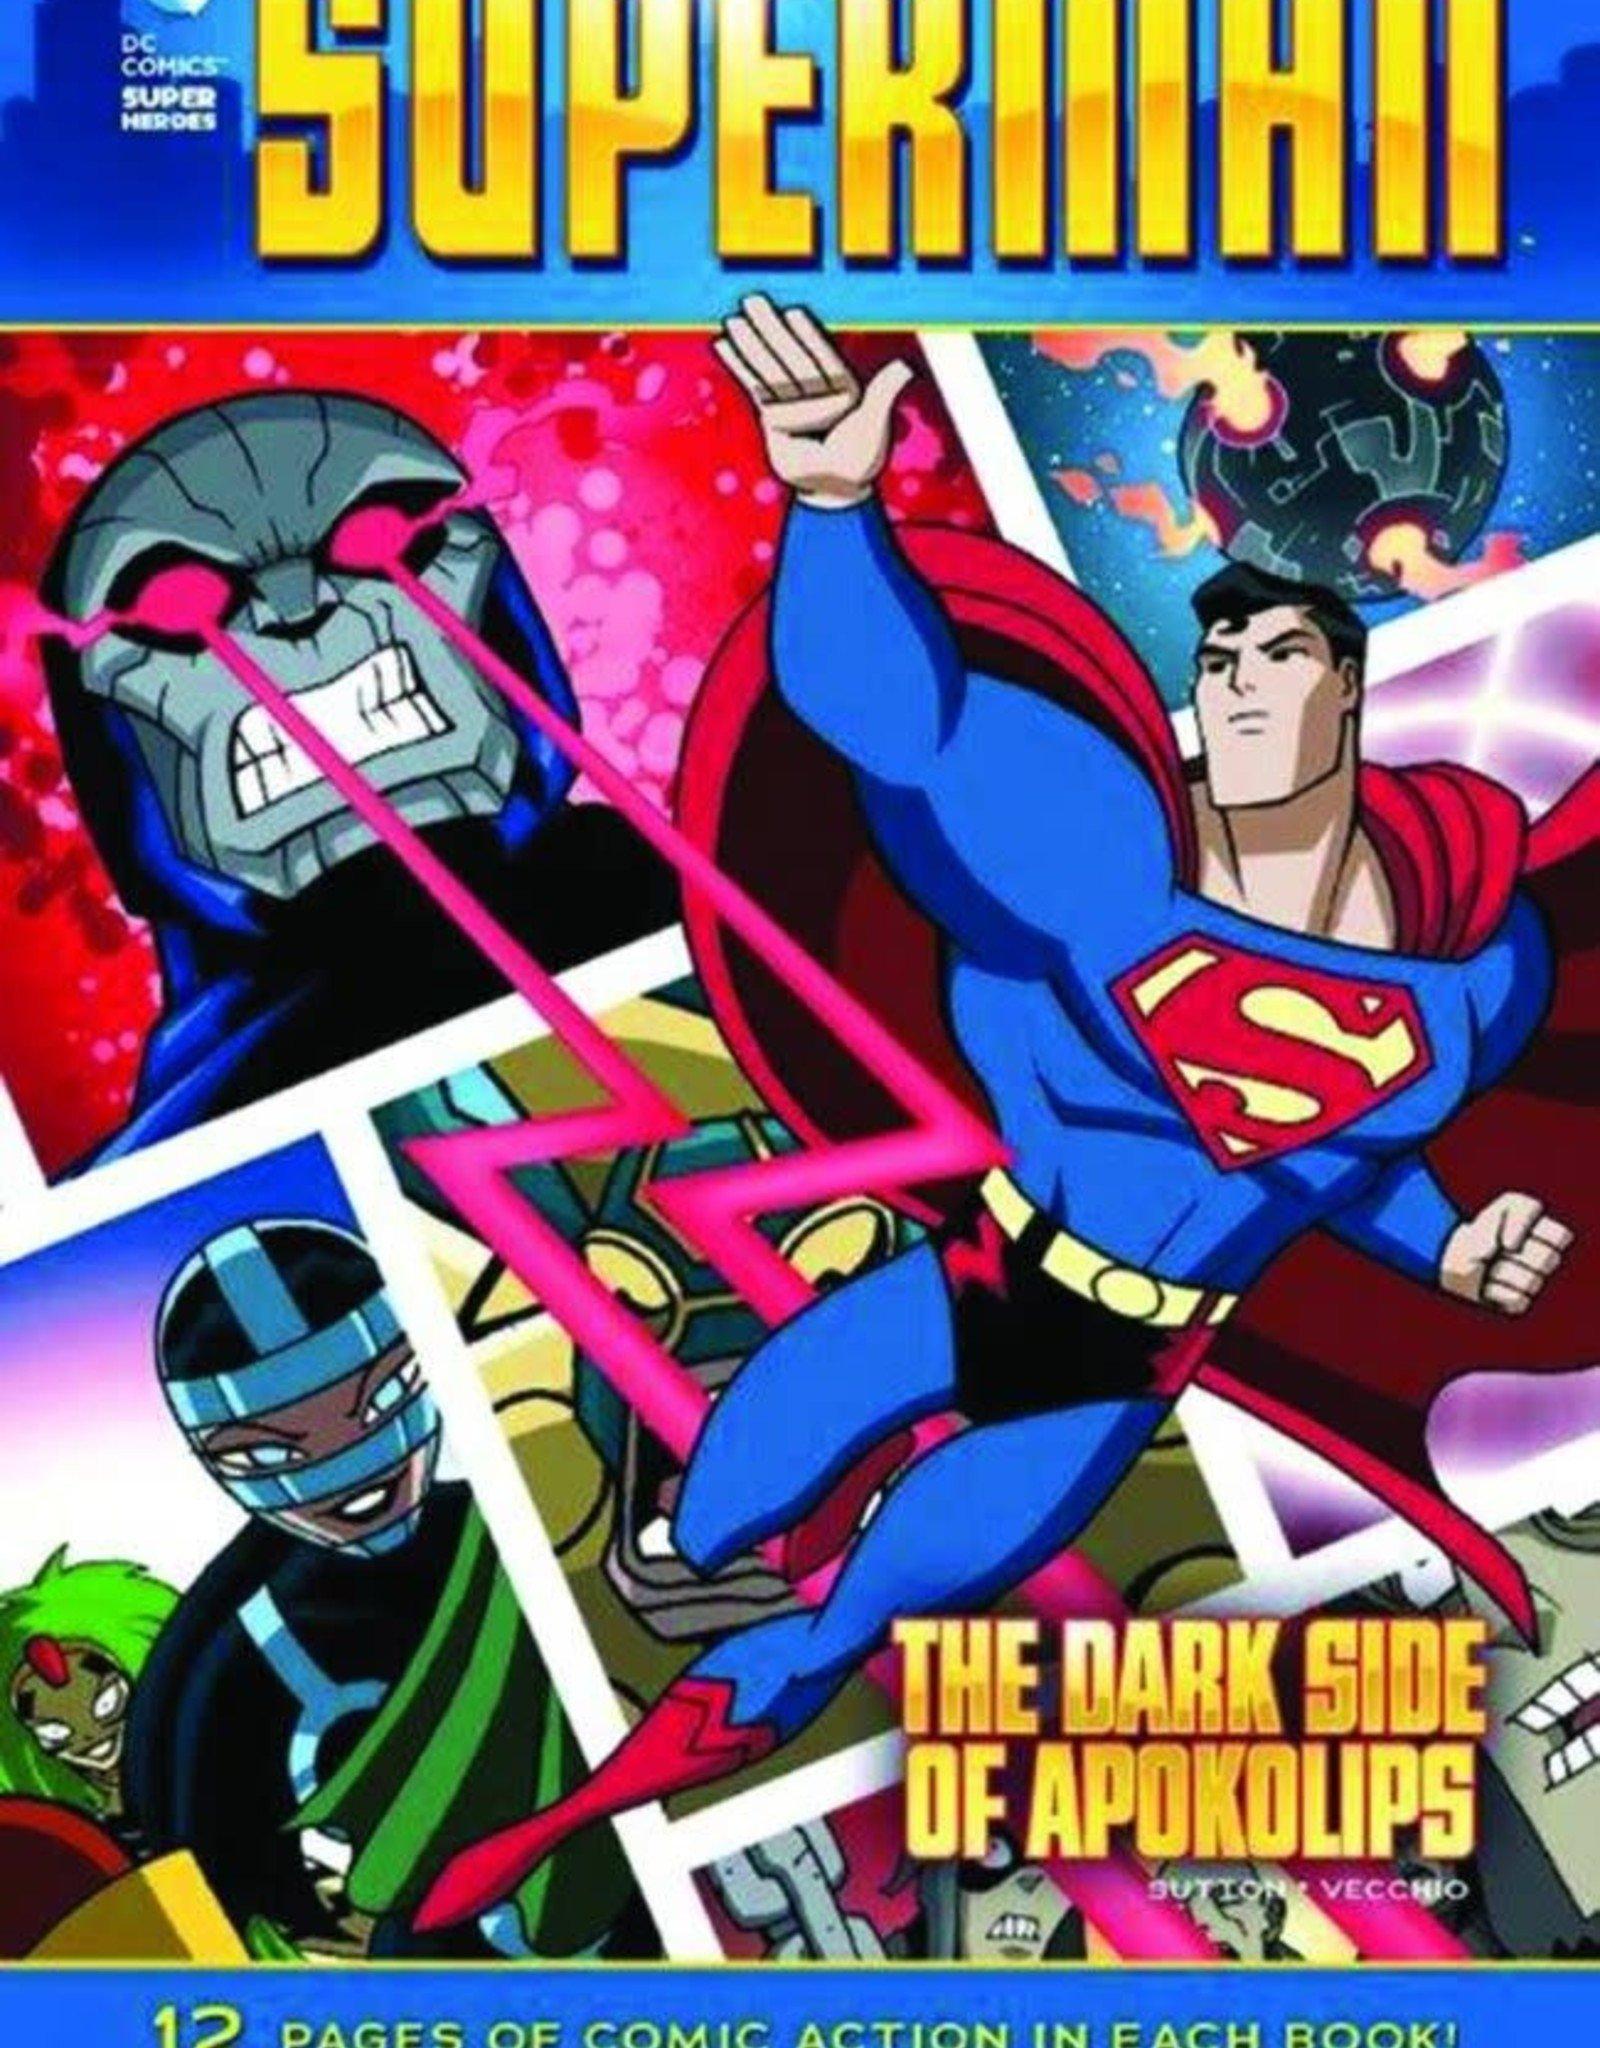 Capstone Publishing DC Super Heroes Superman The Dark Side of Apokolips